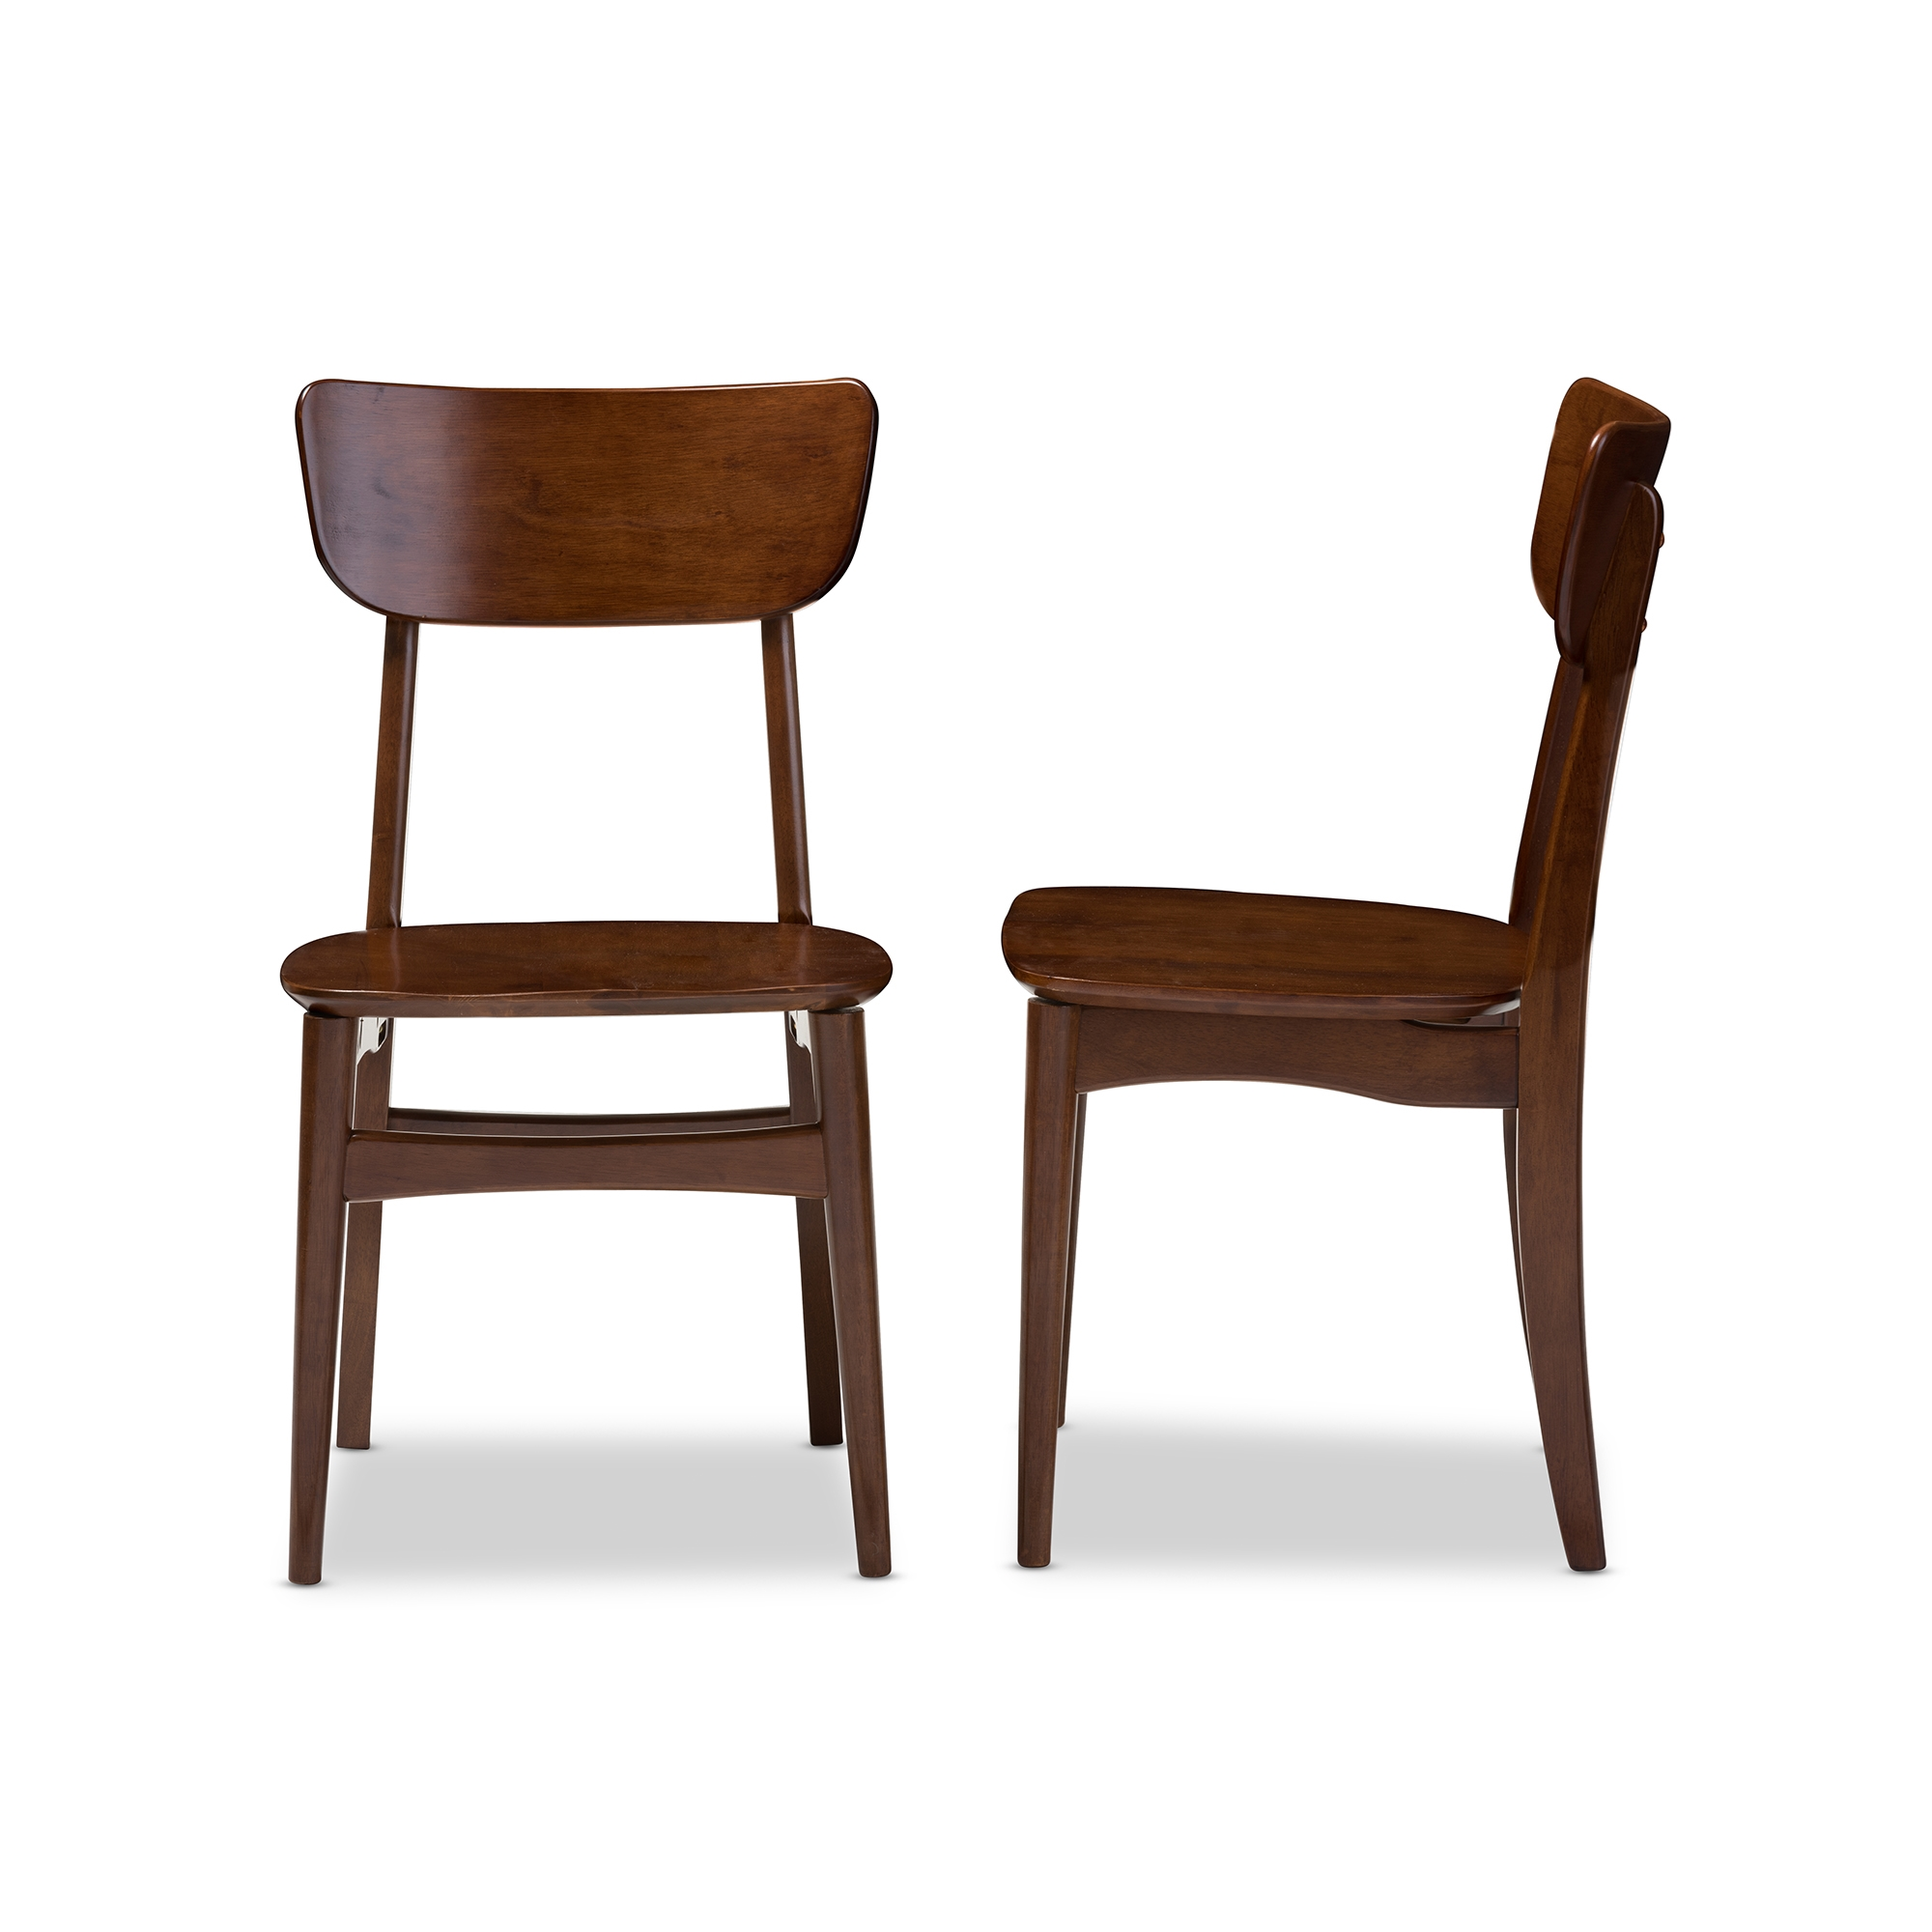 Baxton Studio Netherlands Mid Century Modern Scandinavian Style Dark Walnut  Bent Wood Dining Side Chair